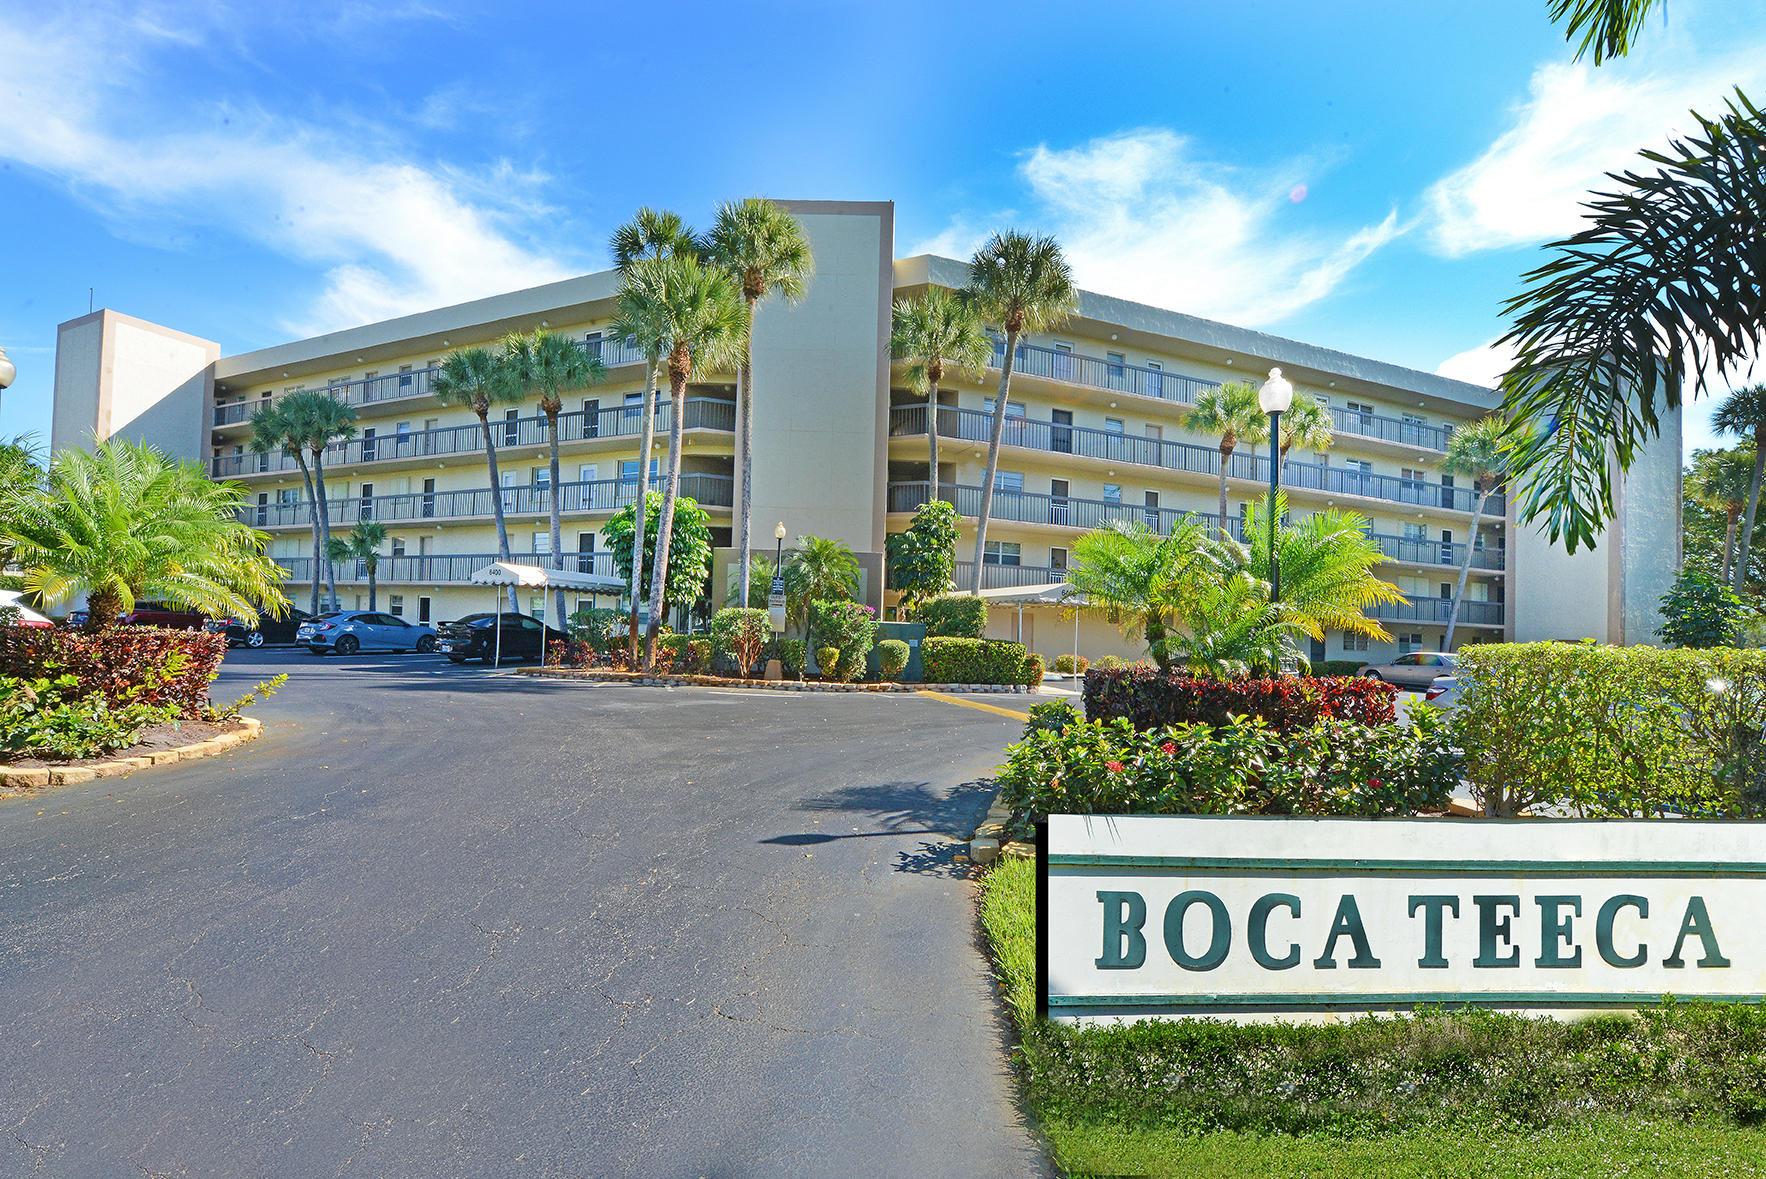 6400 NW 2ND Avenue #2220 Boca Raton, FL 33487